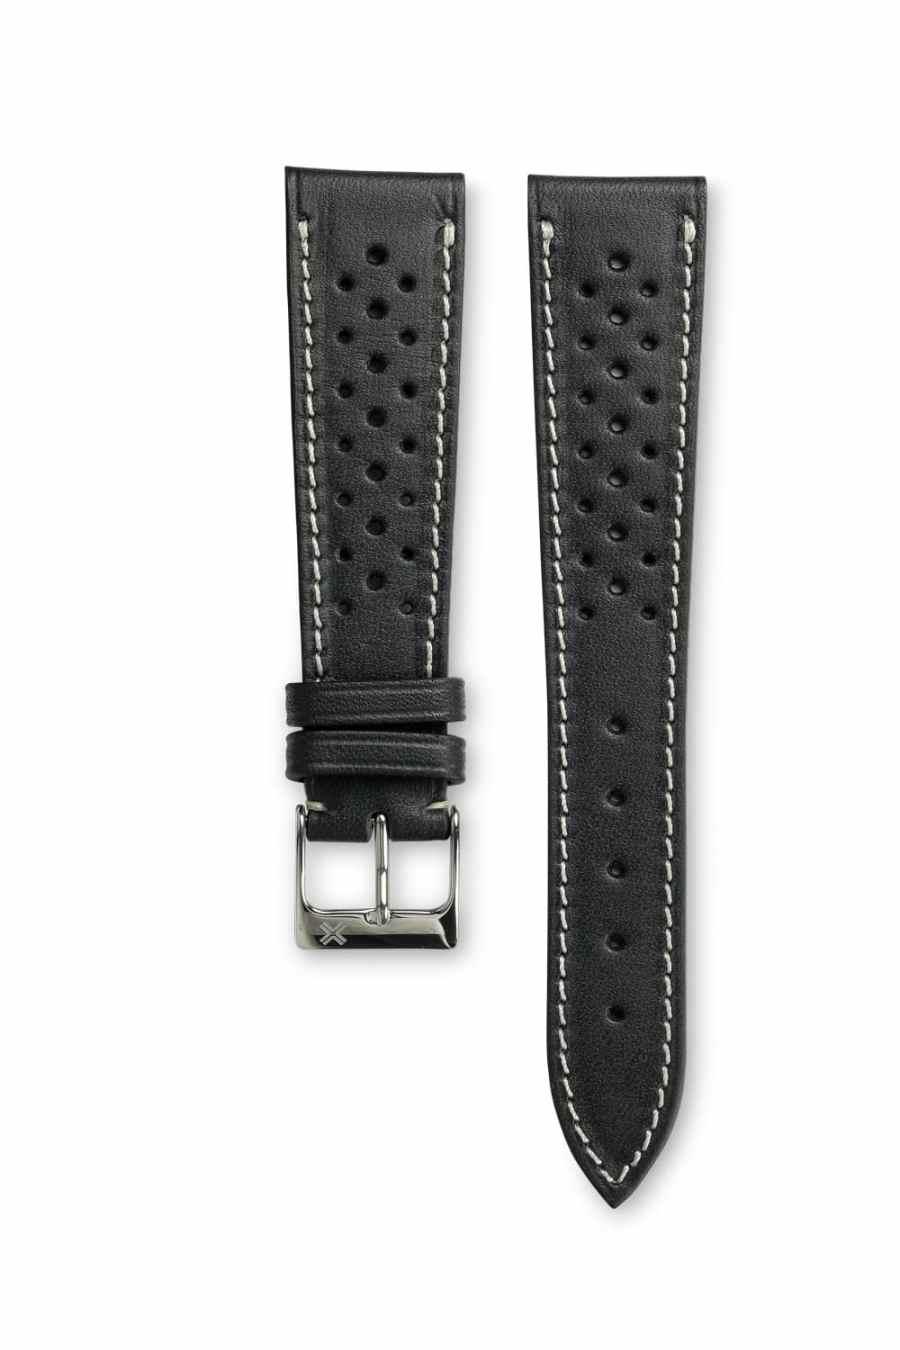 Smooth Racing Barenia deep black leather watch strap - cream stitching - LUGS brand